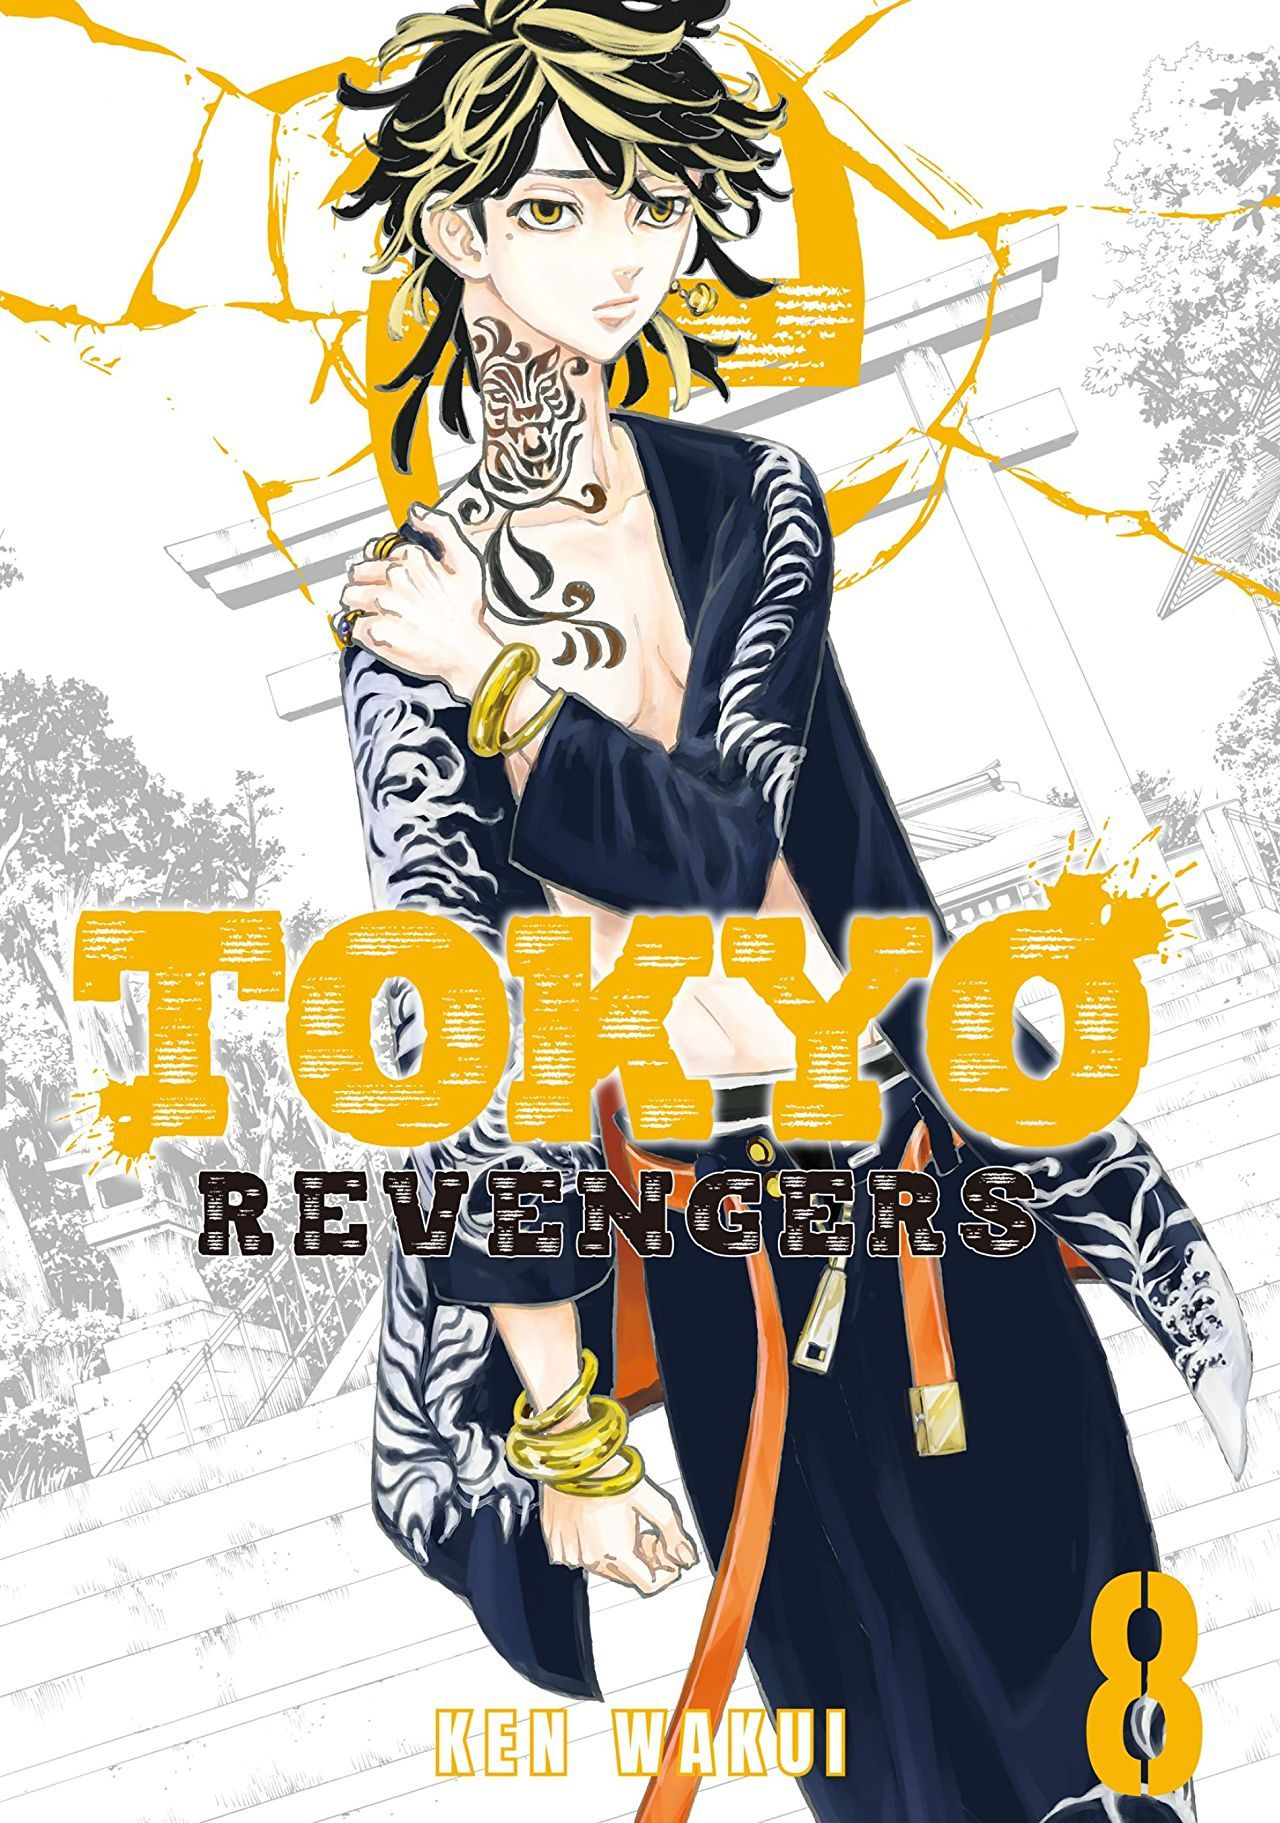 Tokyo Revengers Manga Wallpapers - Wallpaper Cave